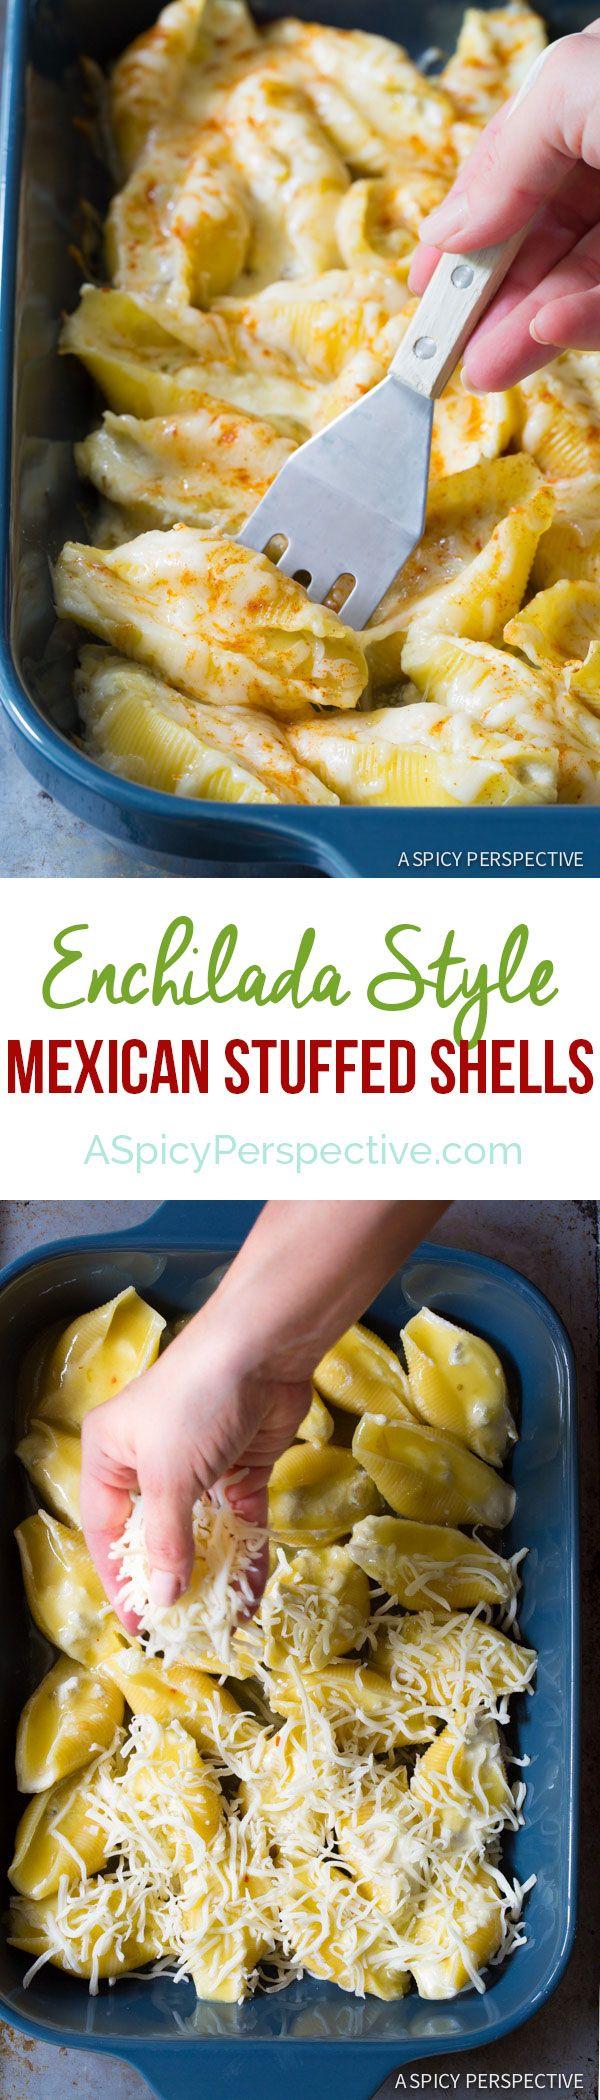 Creamy Enchilada-Style Mexican Stuffed Shells on ASpicyPerspective.com via @spicyperspectiv